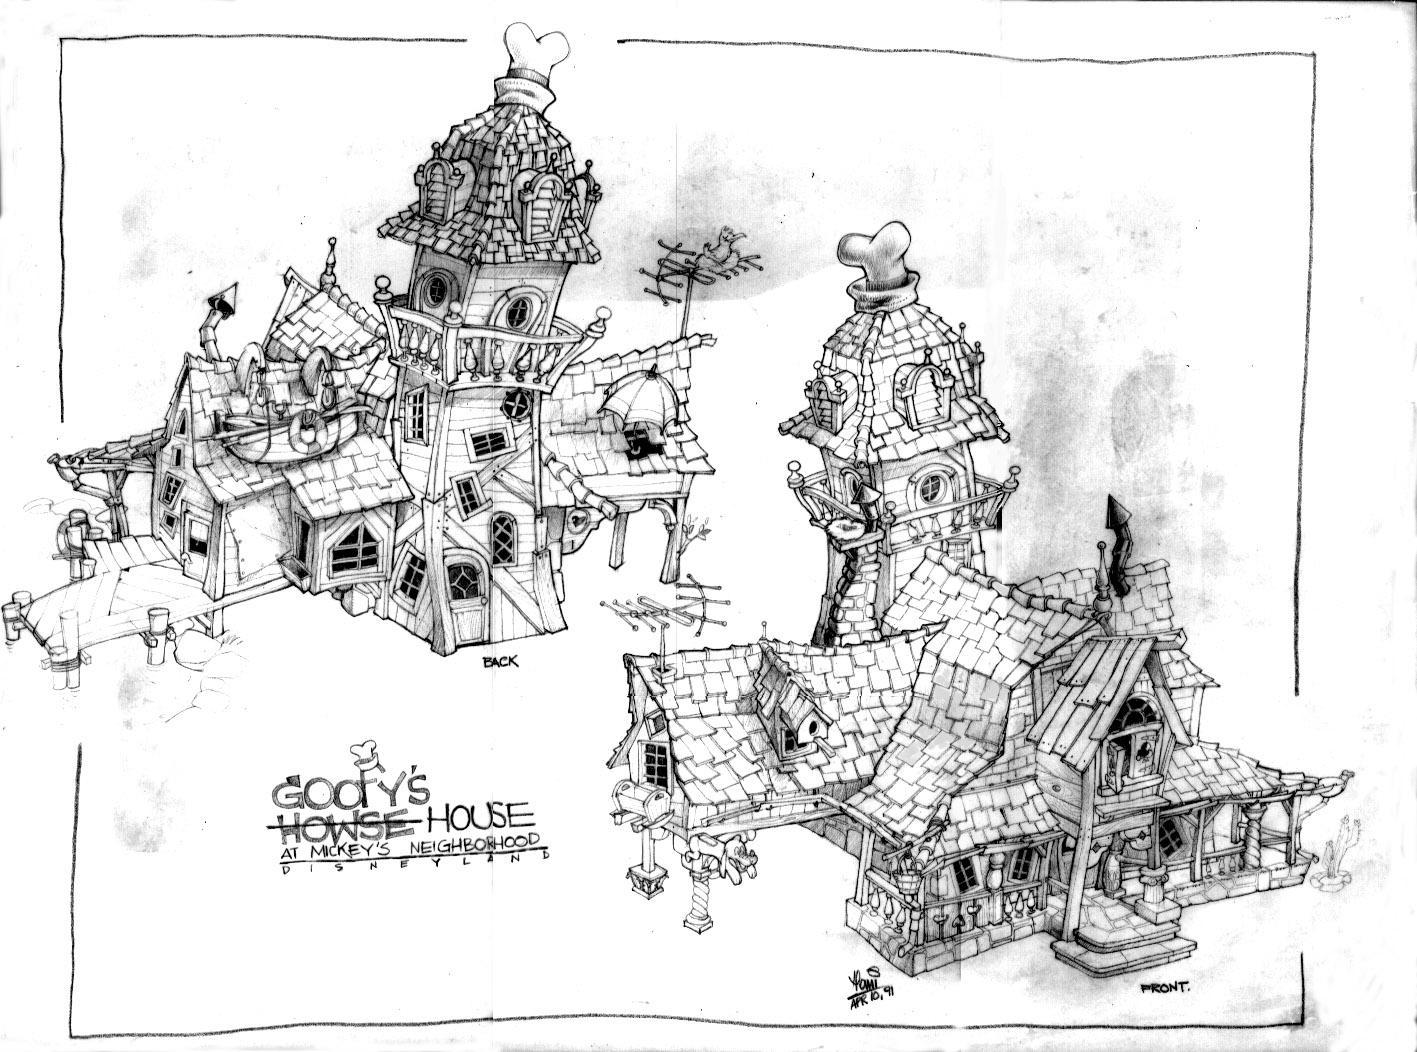 Hani's concept of Goofy's Bounce House in Disneyland's ToonTown